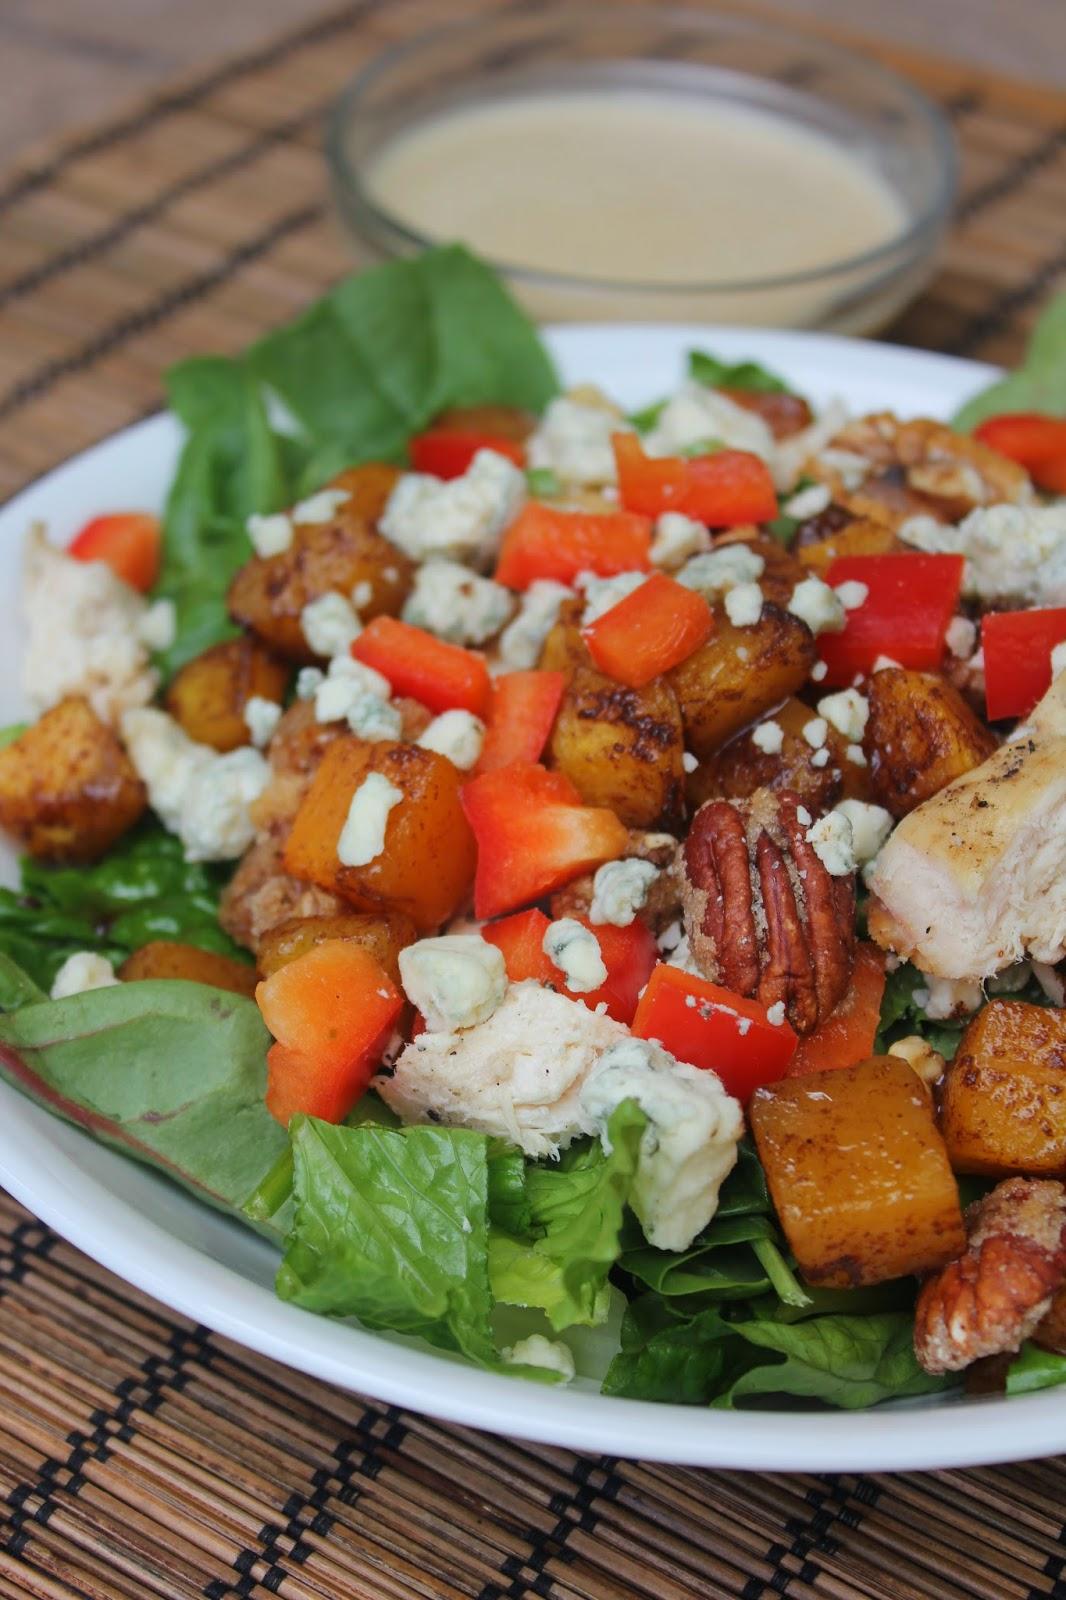 Toscana Italian Bistro Butternut Squash Salad with Maple Sage Cream Dressing, Recipe:  Salad, Recipe:  Chicken, Copycat Recipes, Easy Meal Ideas